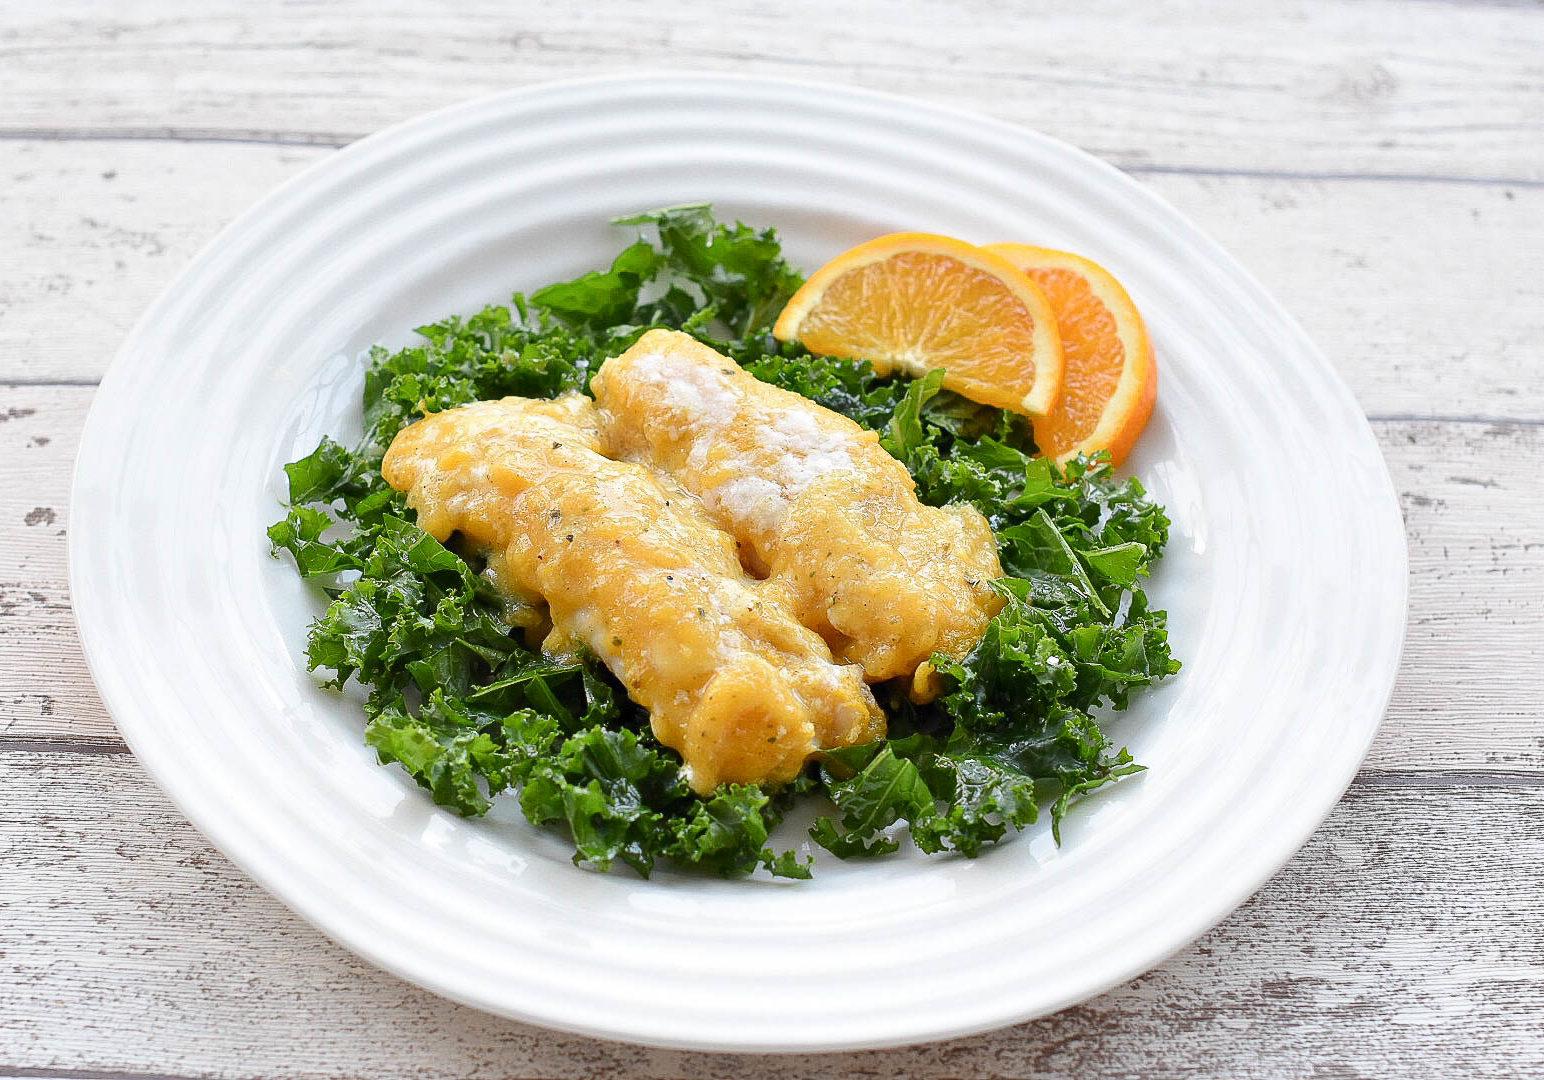 mangooragngebakedfish (1 of 1)